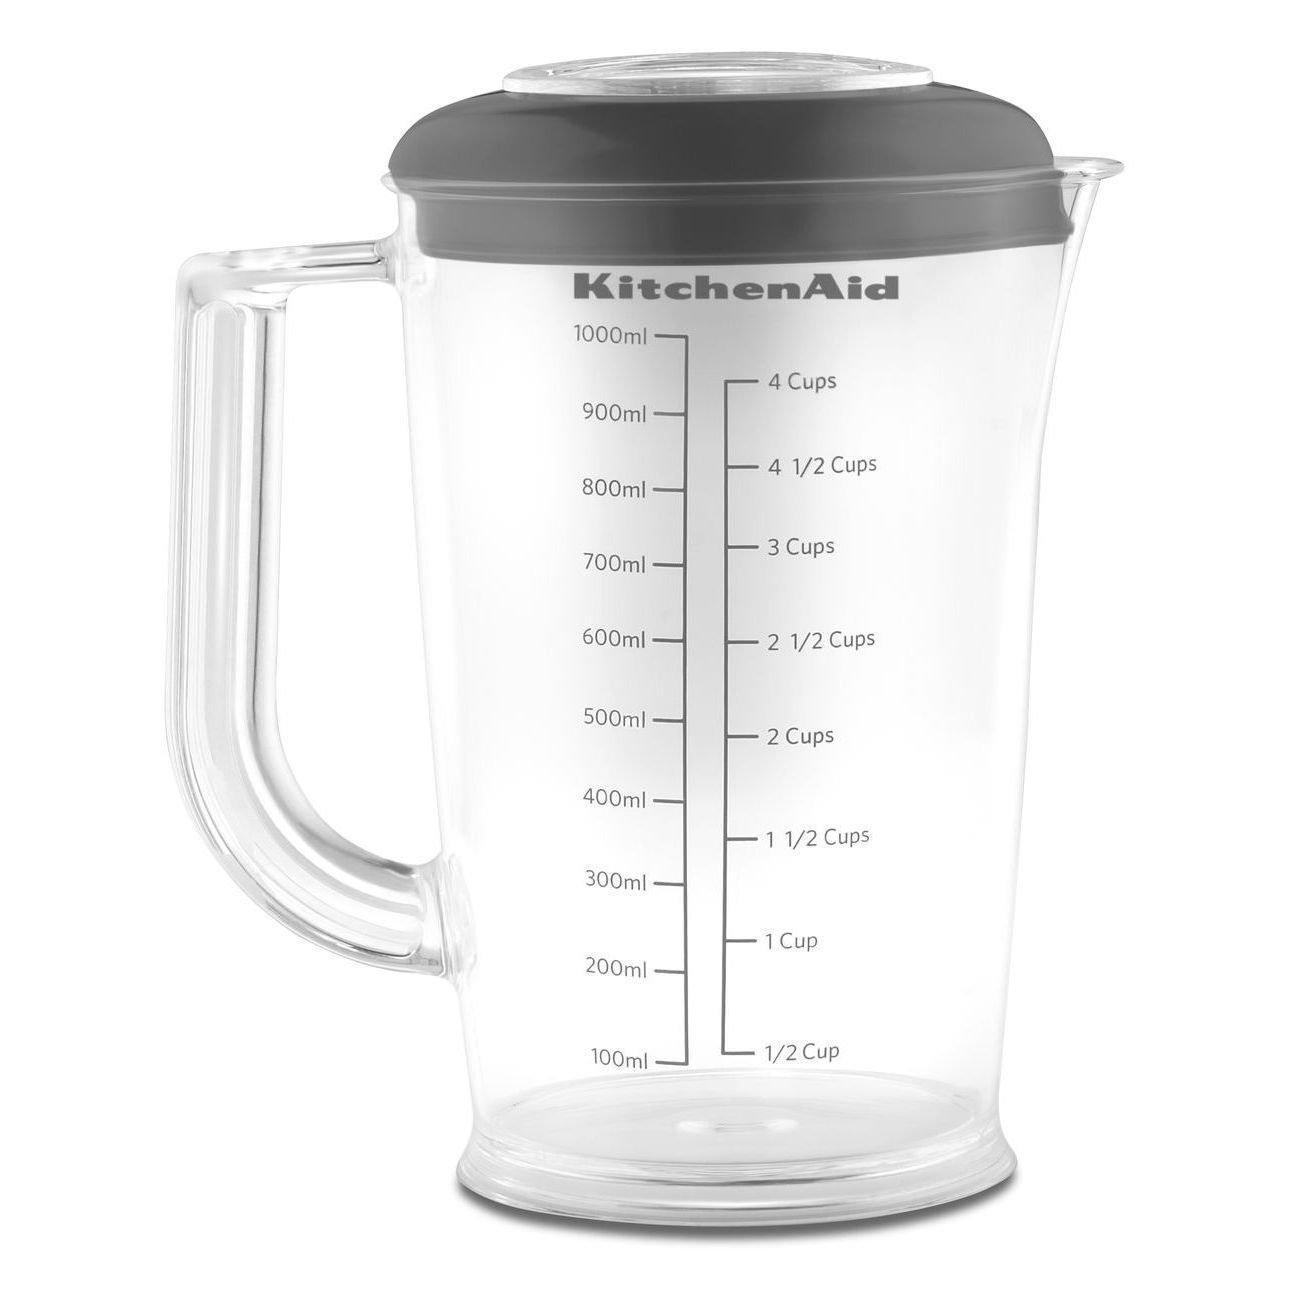 KitchenAid KHB005 4 Cup (1 Liter) BPA-Free Blending Pitcher with Lid